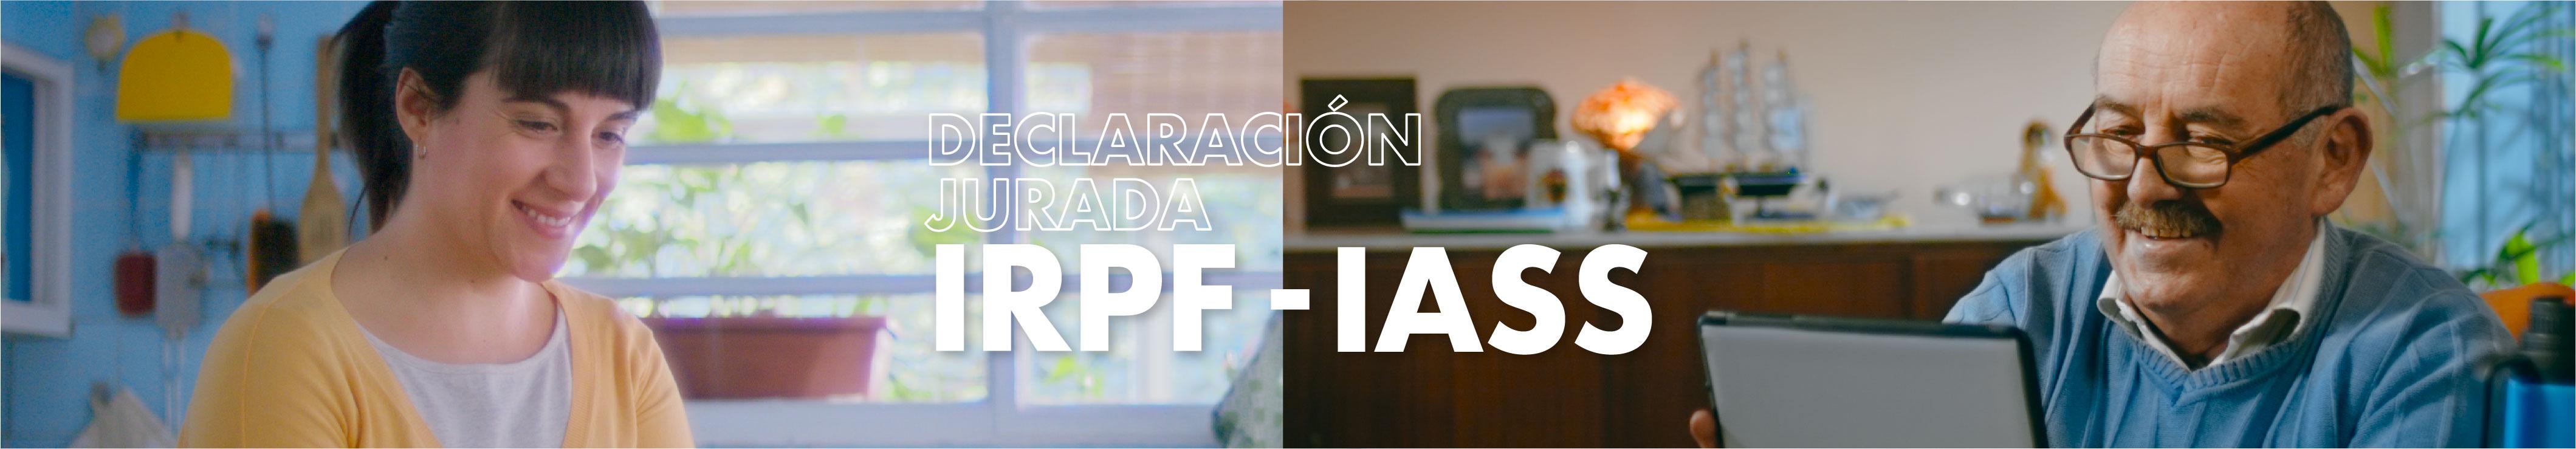 Declaración Jurada IRPF - IASS 2019